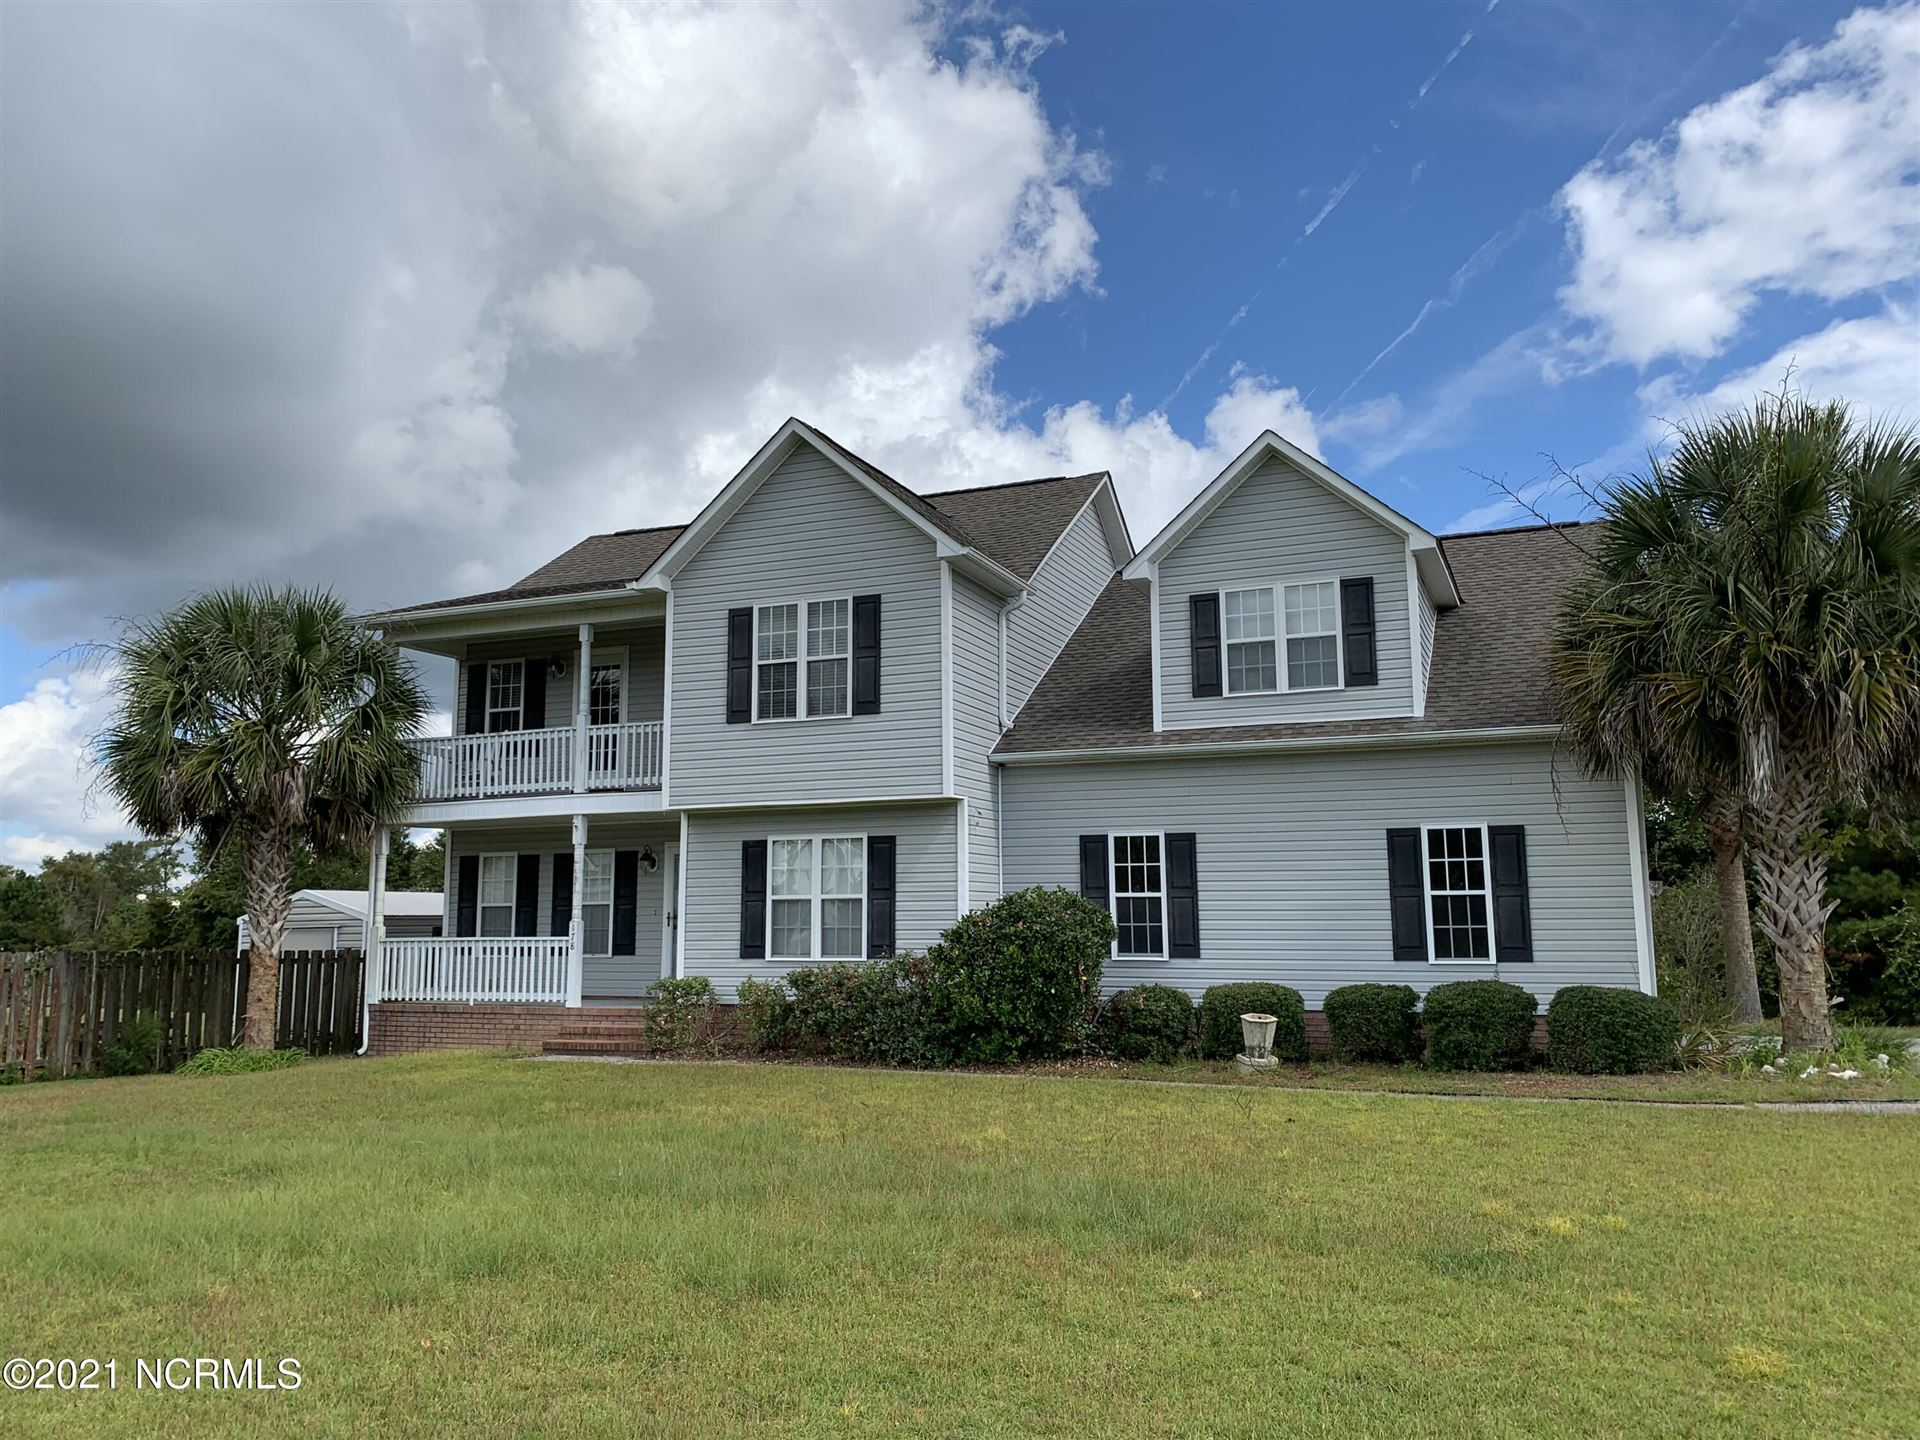 Photo of 178 E Ridge Court, Jacksonville, NC 28540 (MLS # 100295207)